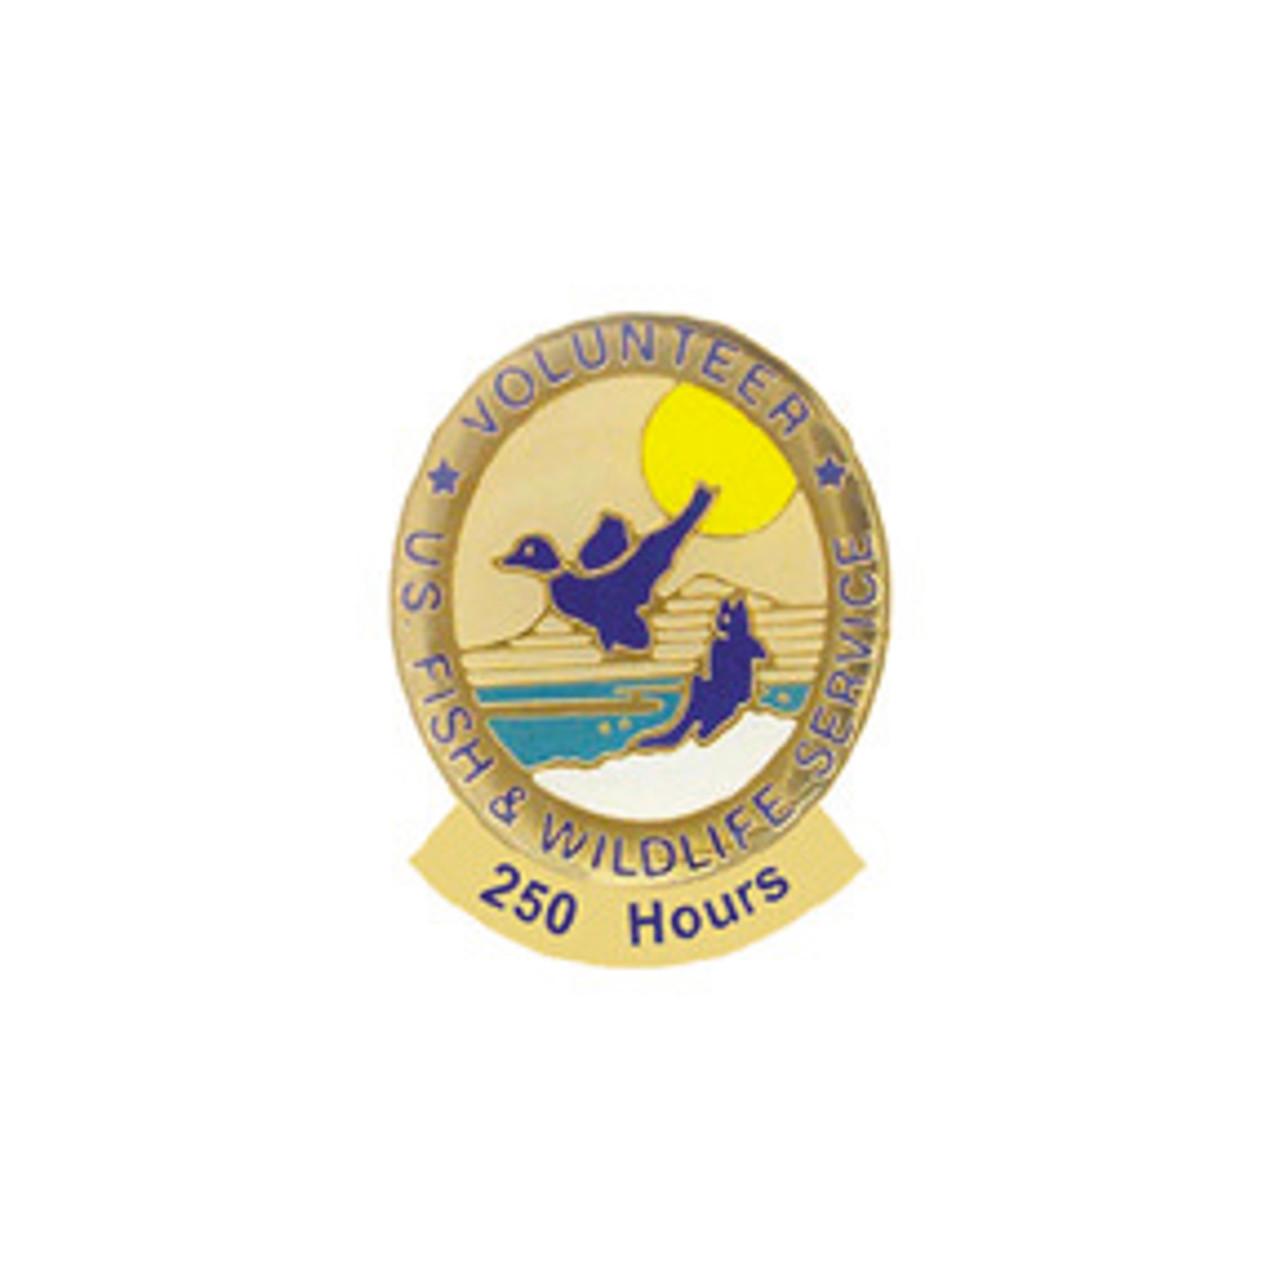 Fish & Wildlife Volunteer Hours Pin (7000 hours)